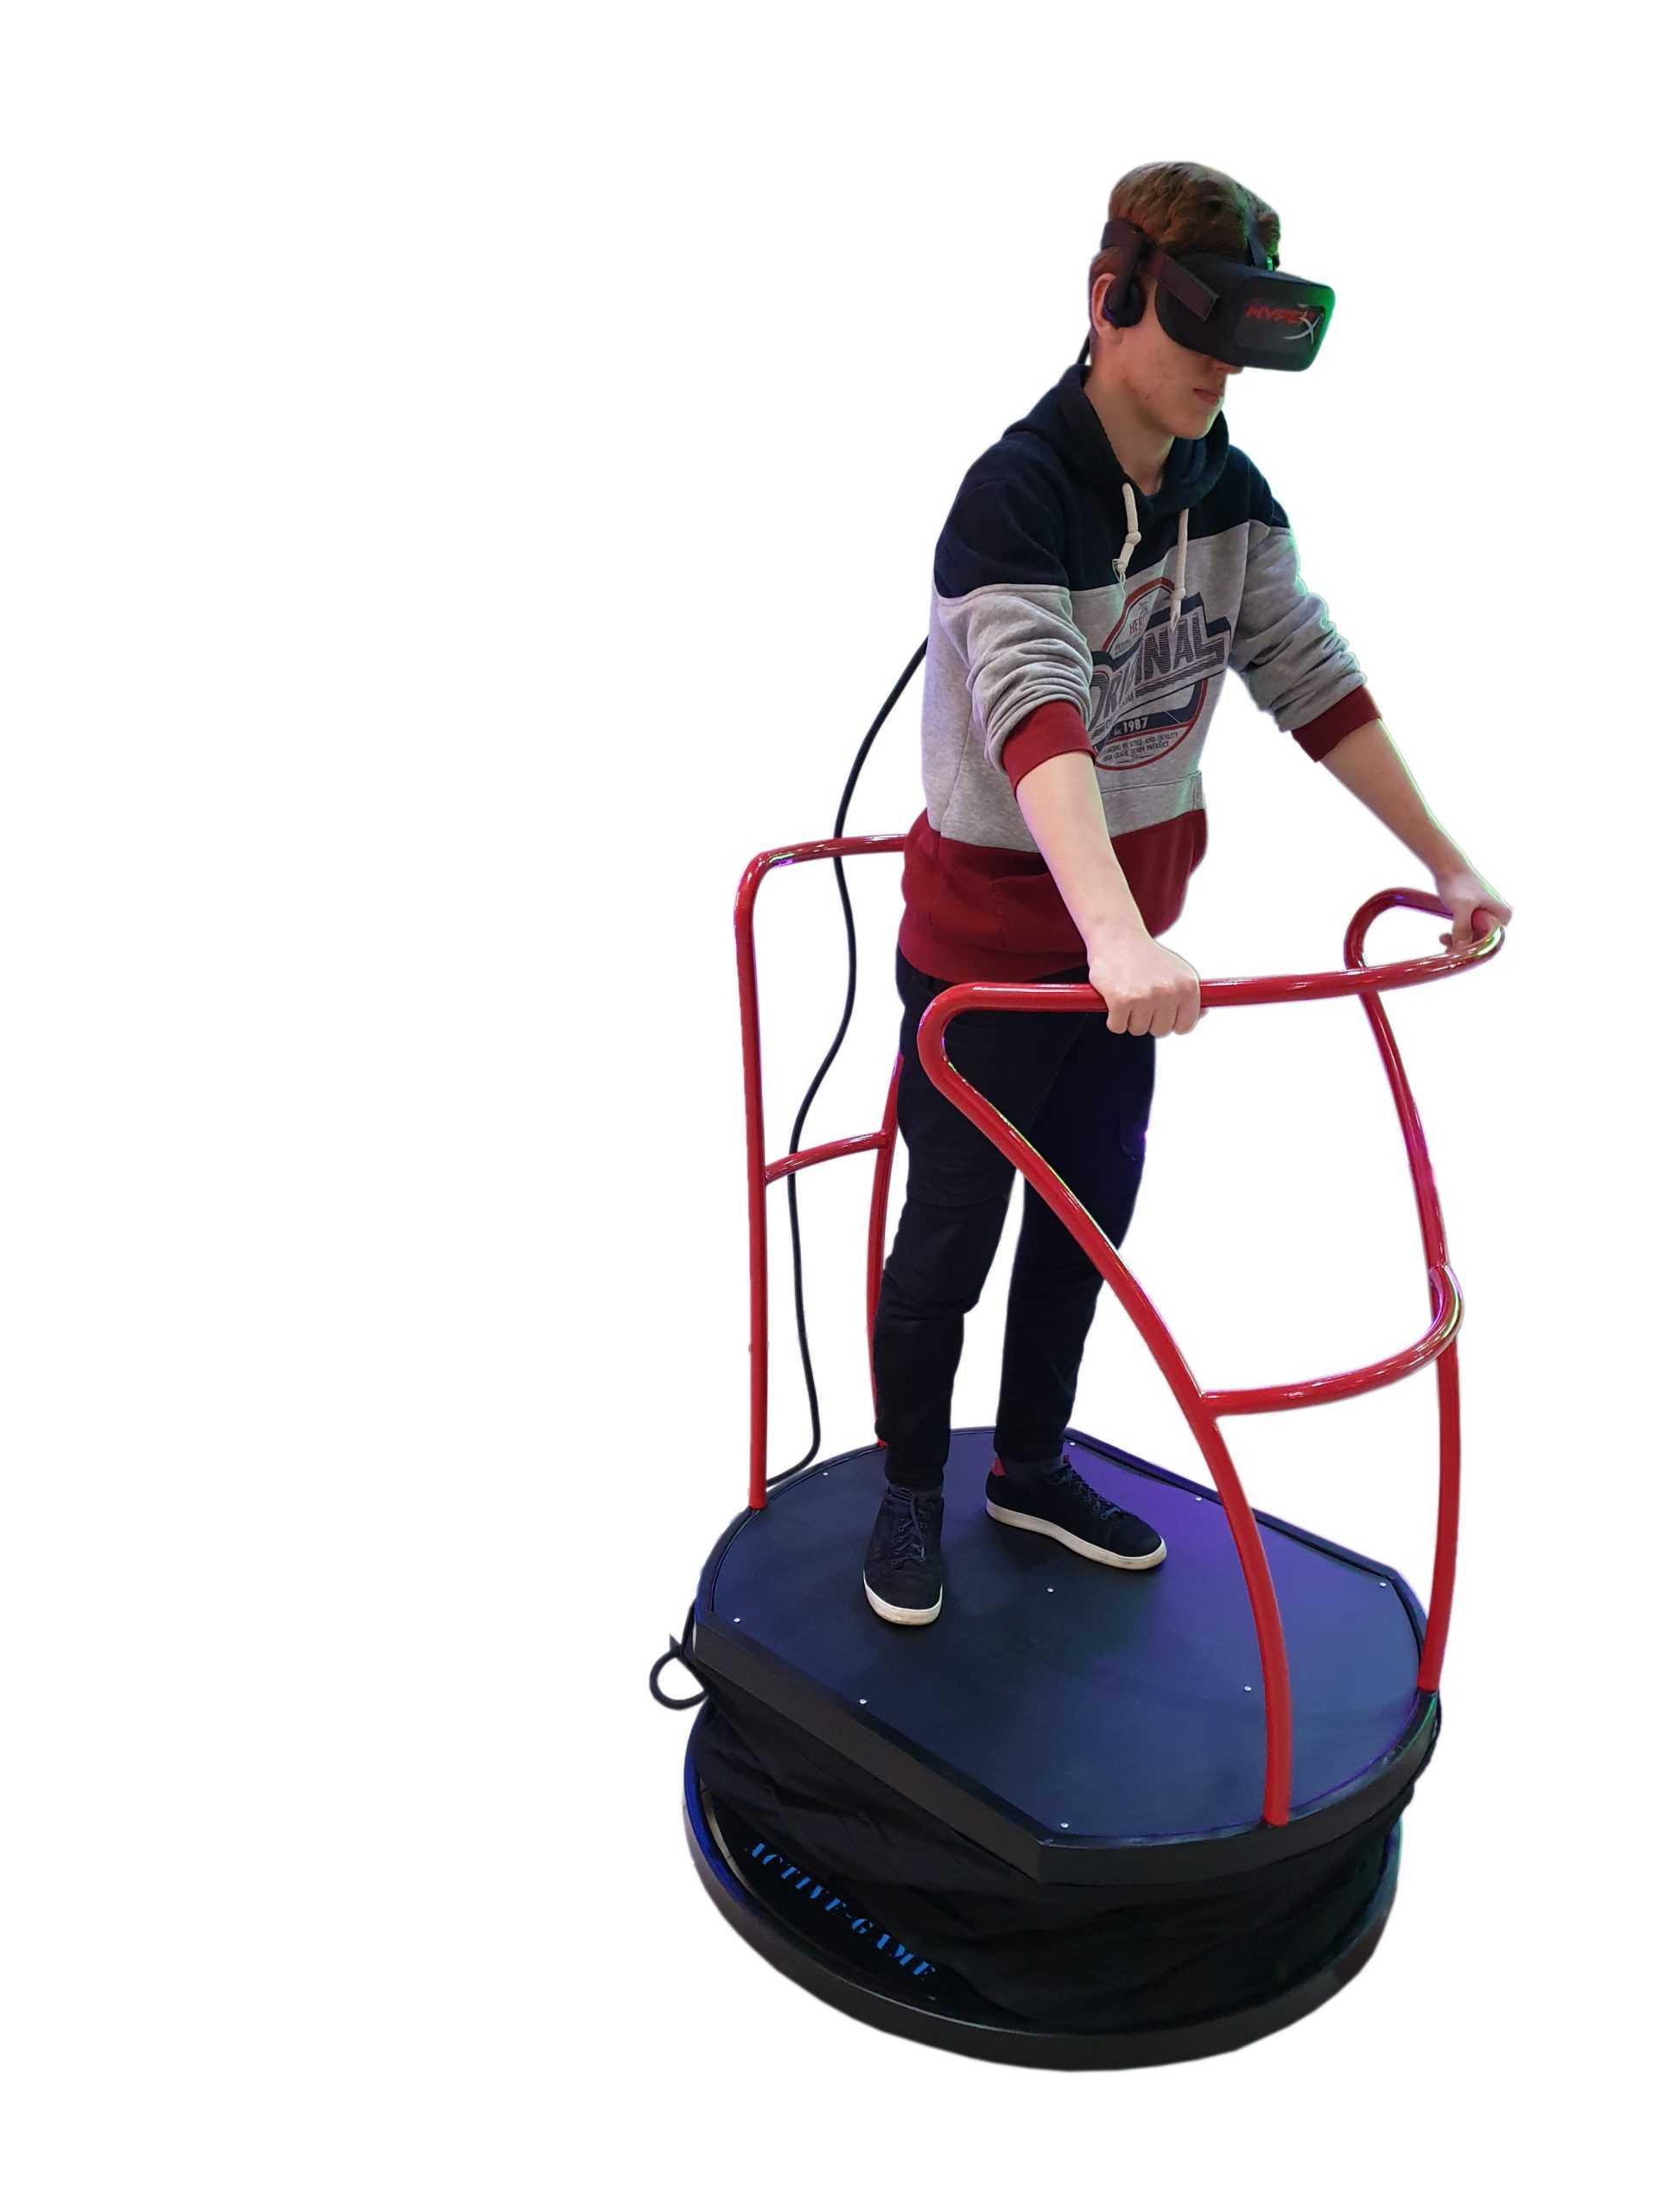 Extreme_SIM_2 Full motion VR simulator 2dof, 3dof,4dof,6dof motion platform